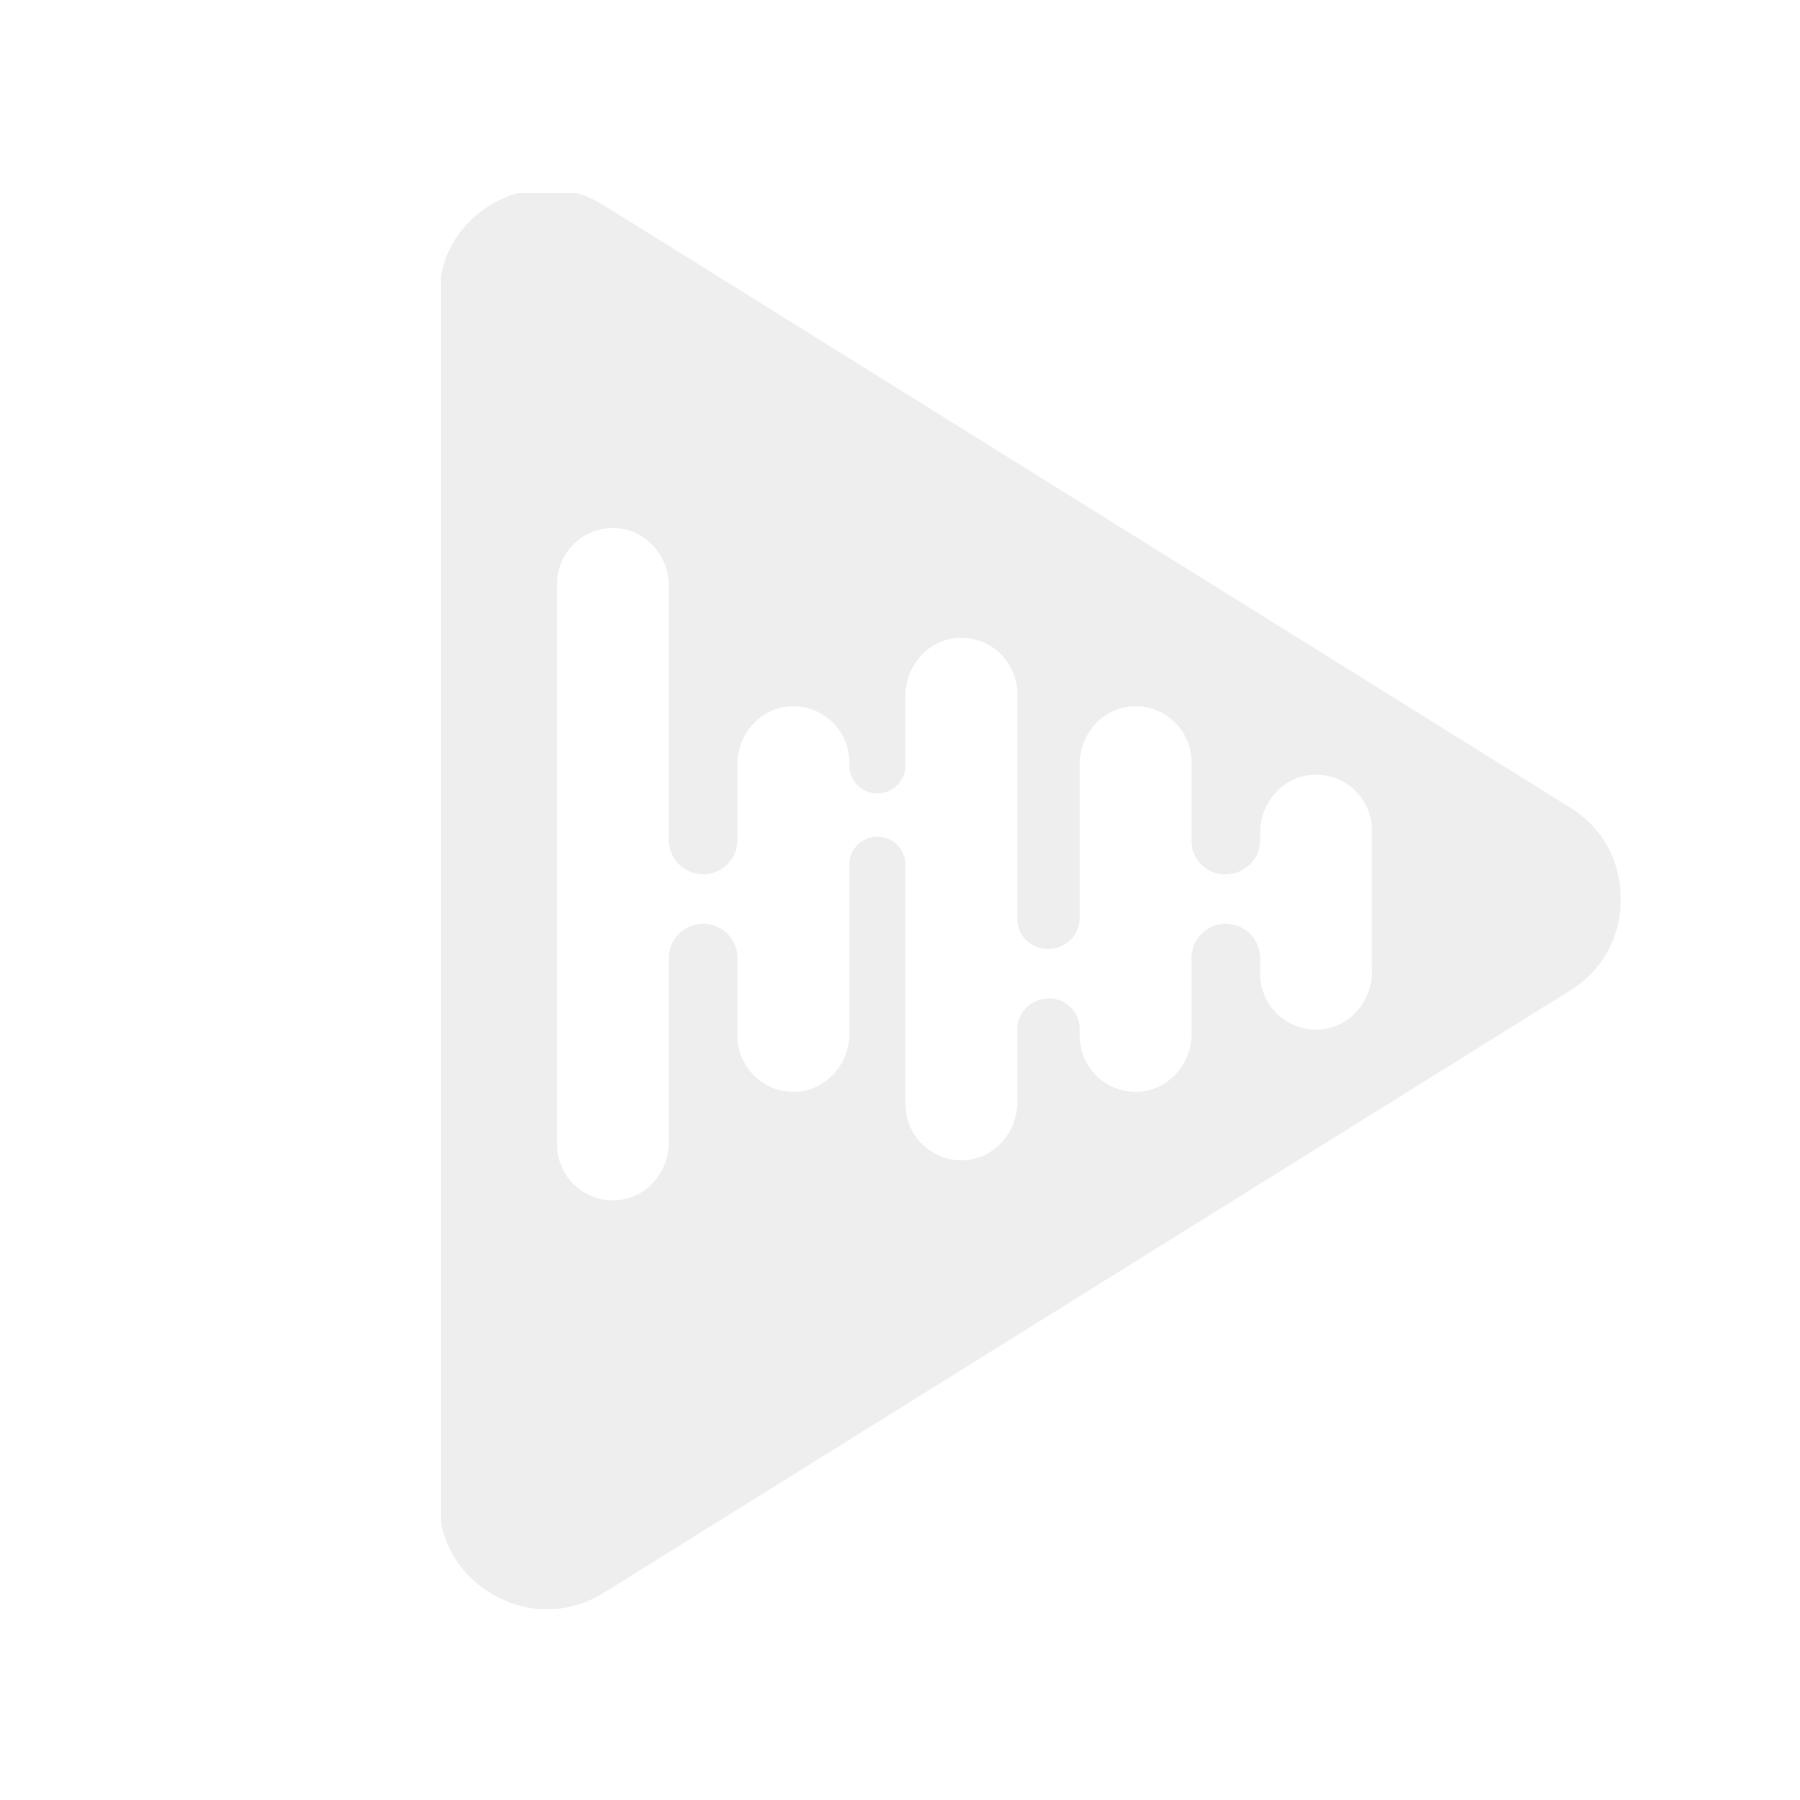 Kufatec Fistune 39702